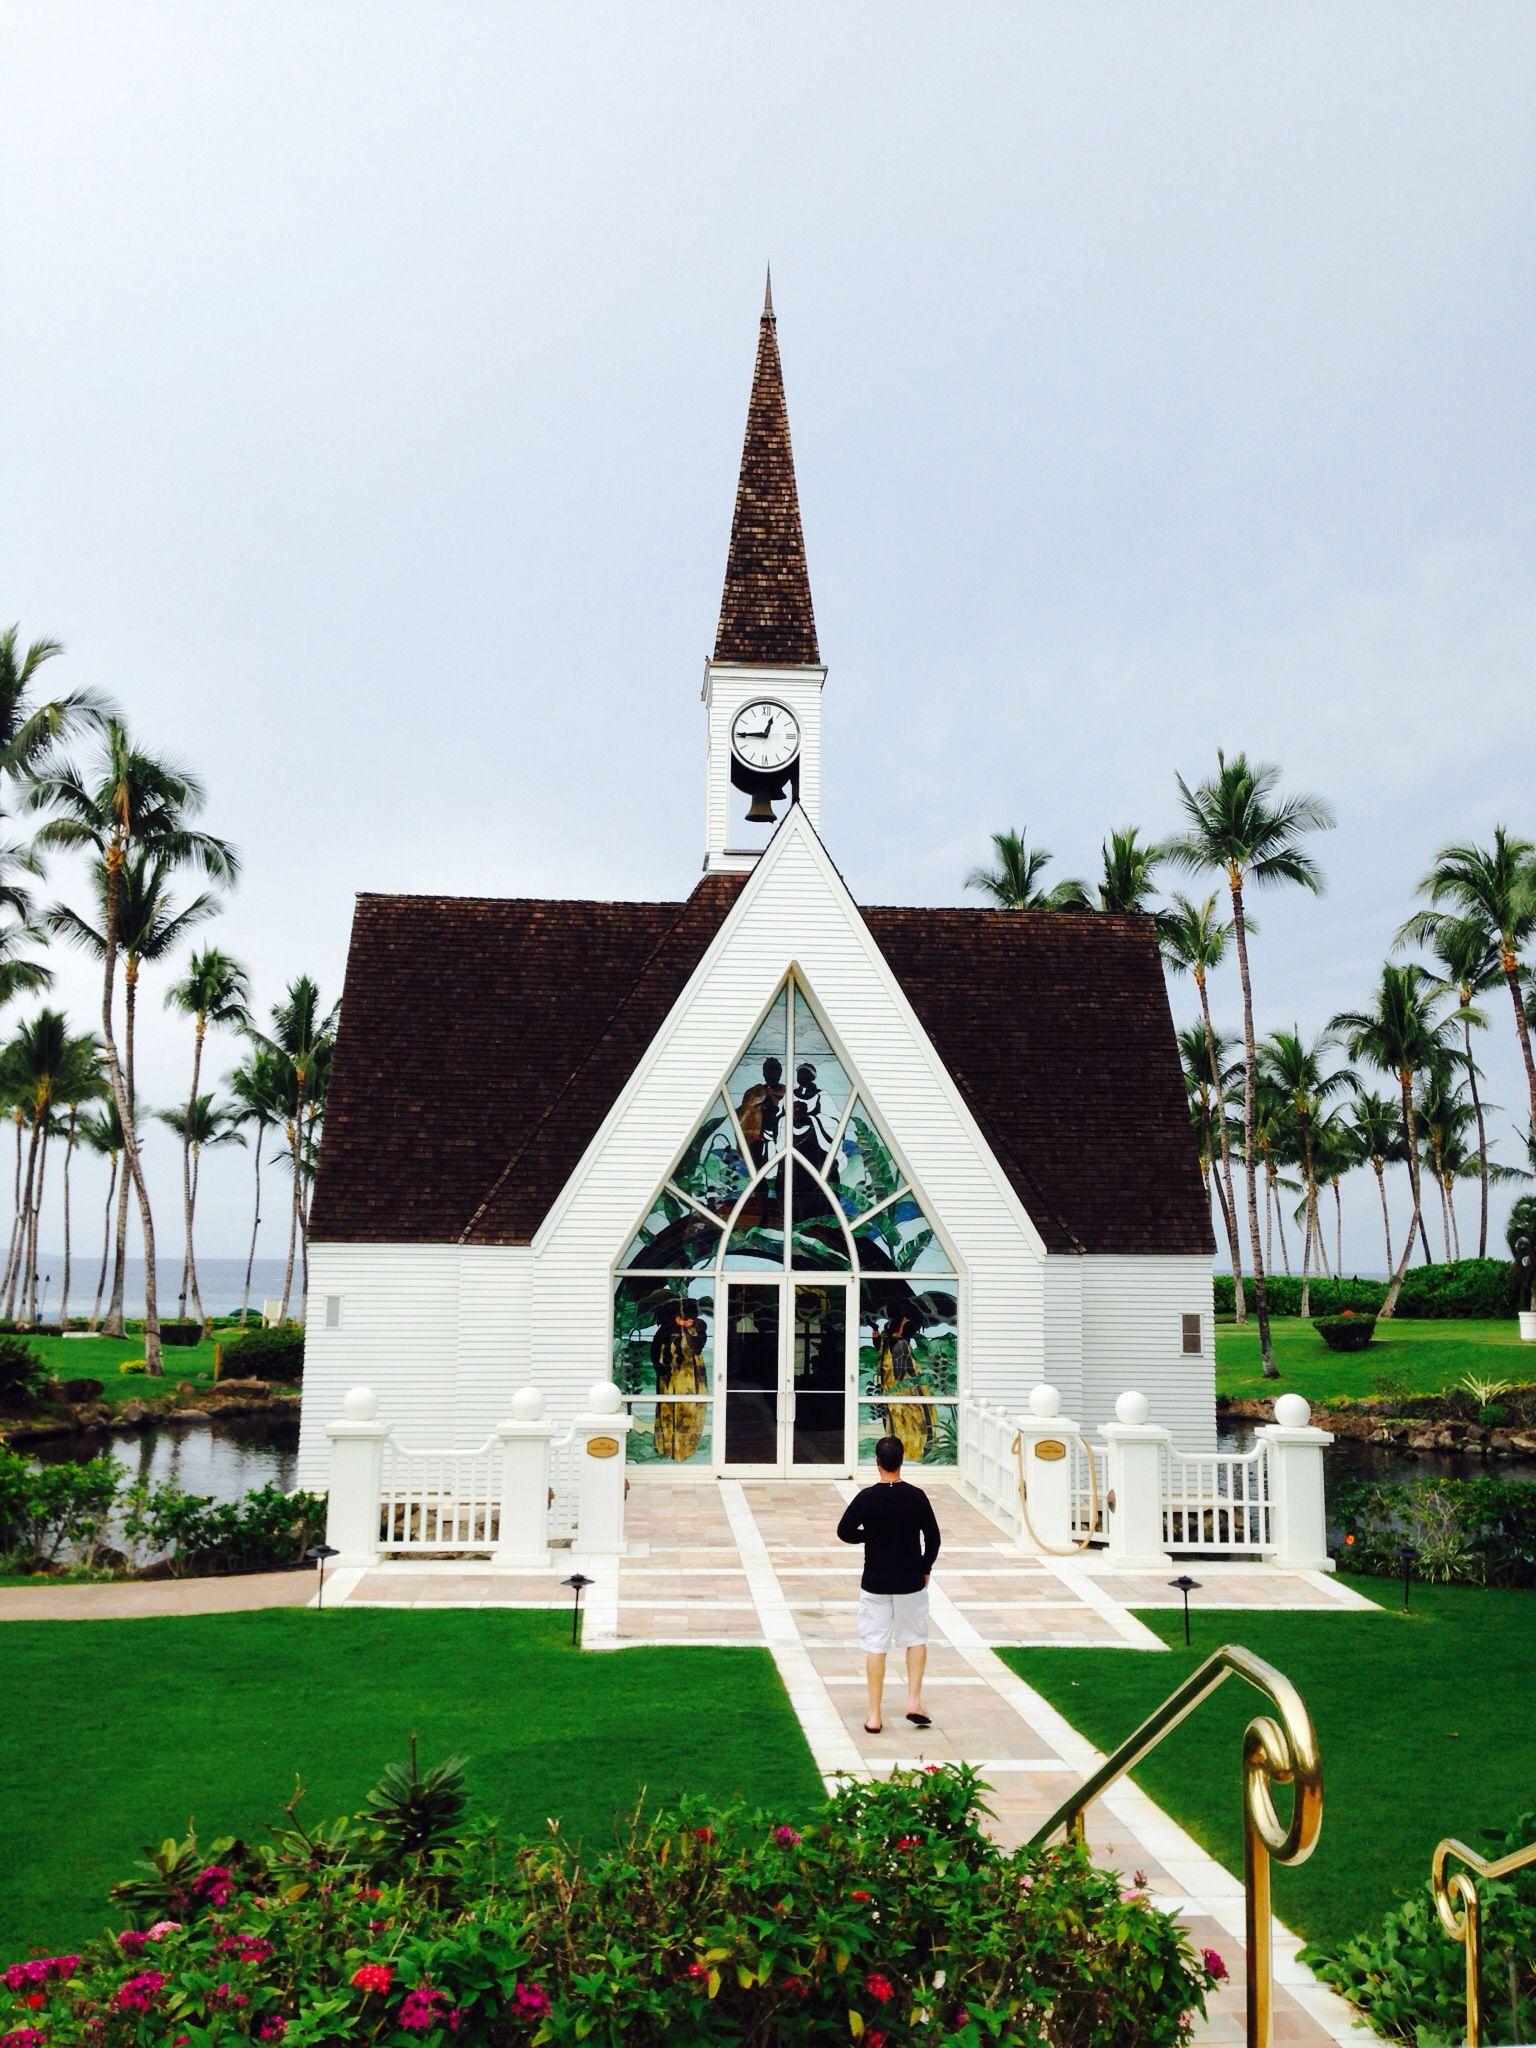 Grand Wailea Wedding Chapel Maui Hawaii Hawaiian Travel Hawaii Travel Guide Hawaii Travel